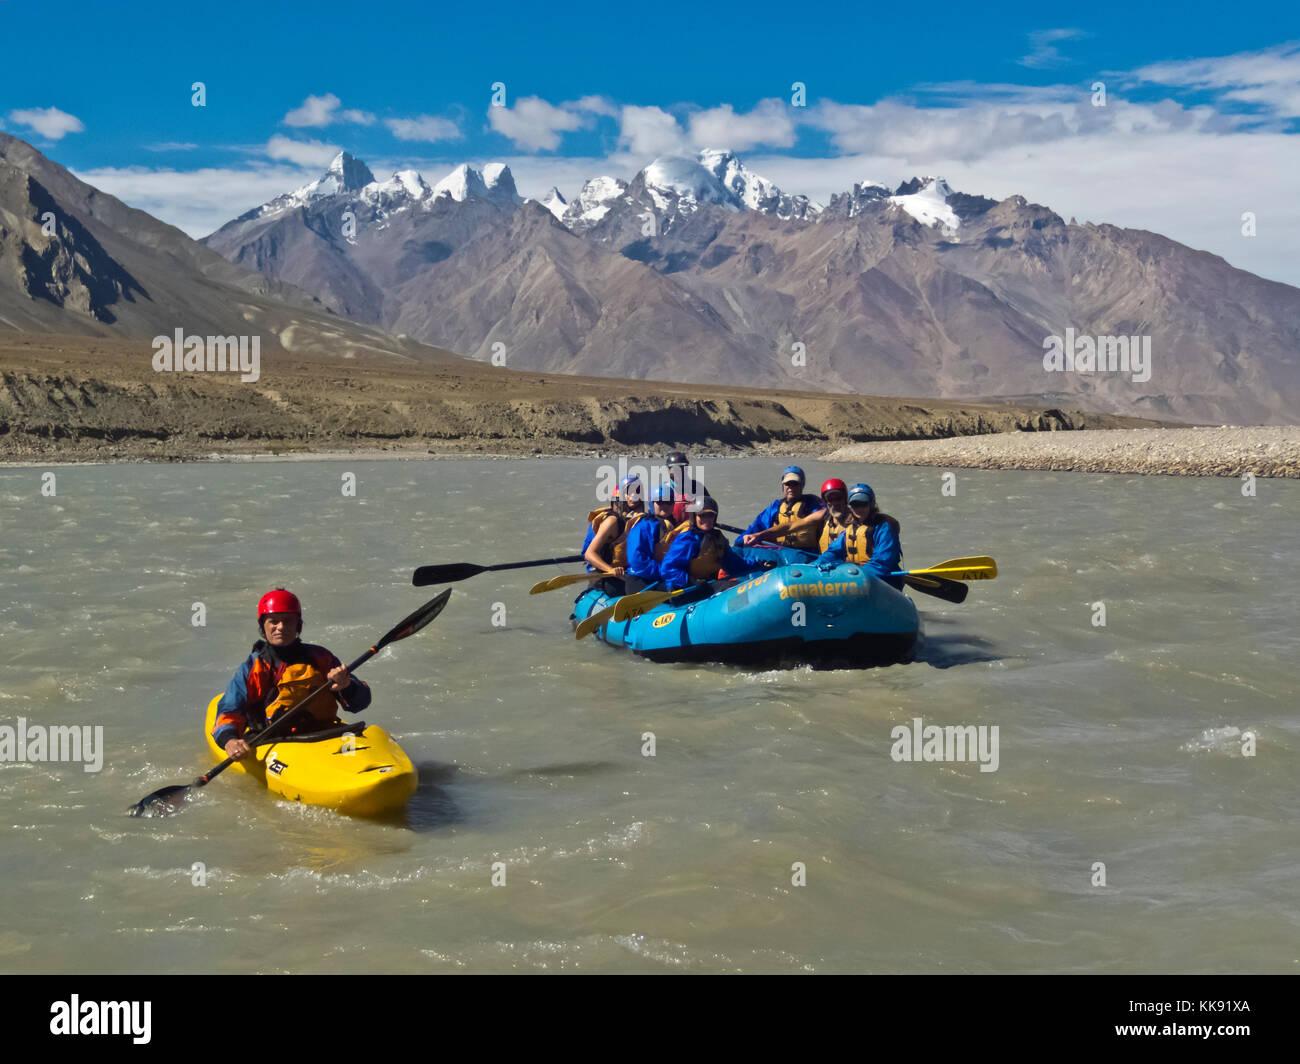 River rafting through the remote STOD RIVER VALLEY - ZANSKAR, LADAKH, INDIA - Stock Image